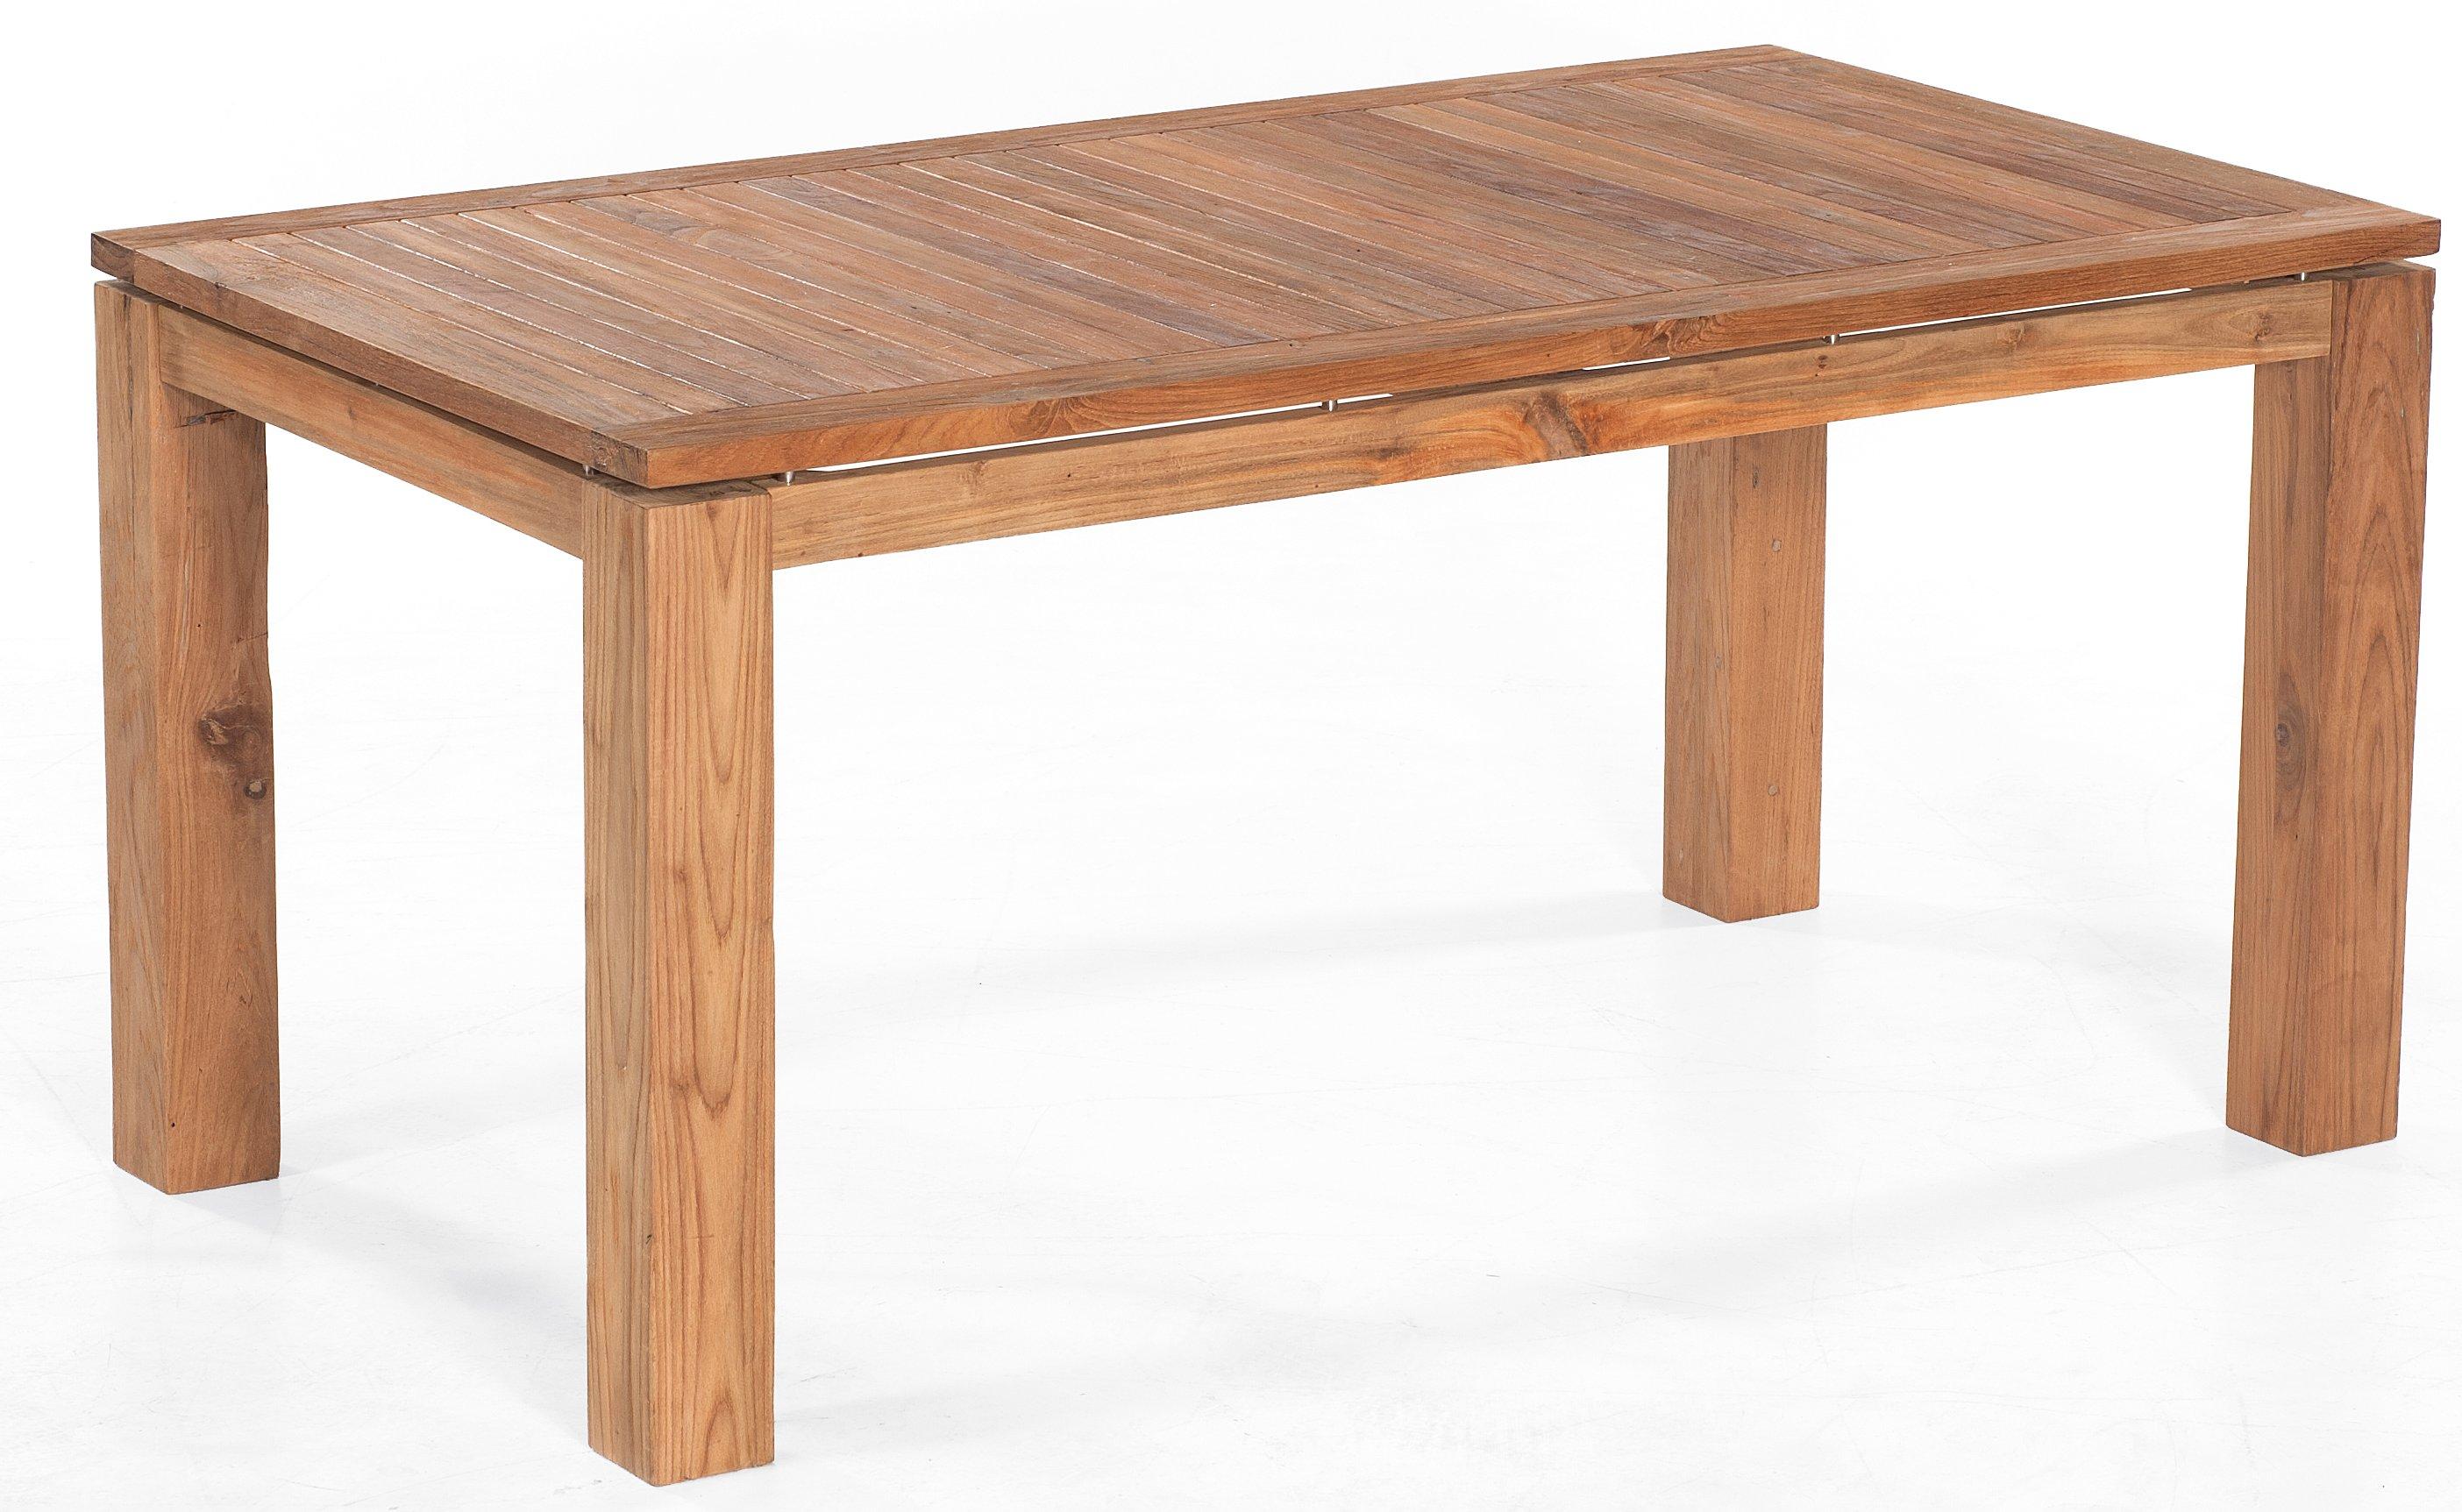 wetterfester massivholz gartentisch hochwertig old teak massive tischplatte. Black Bedroom Furniture Sets. Home Design Ideas